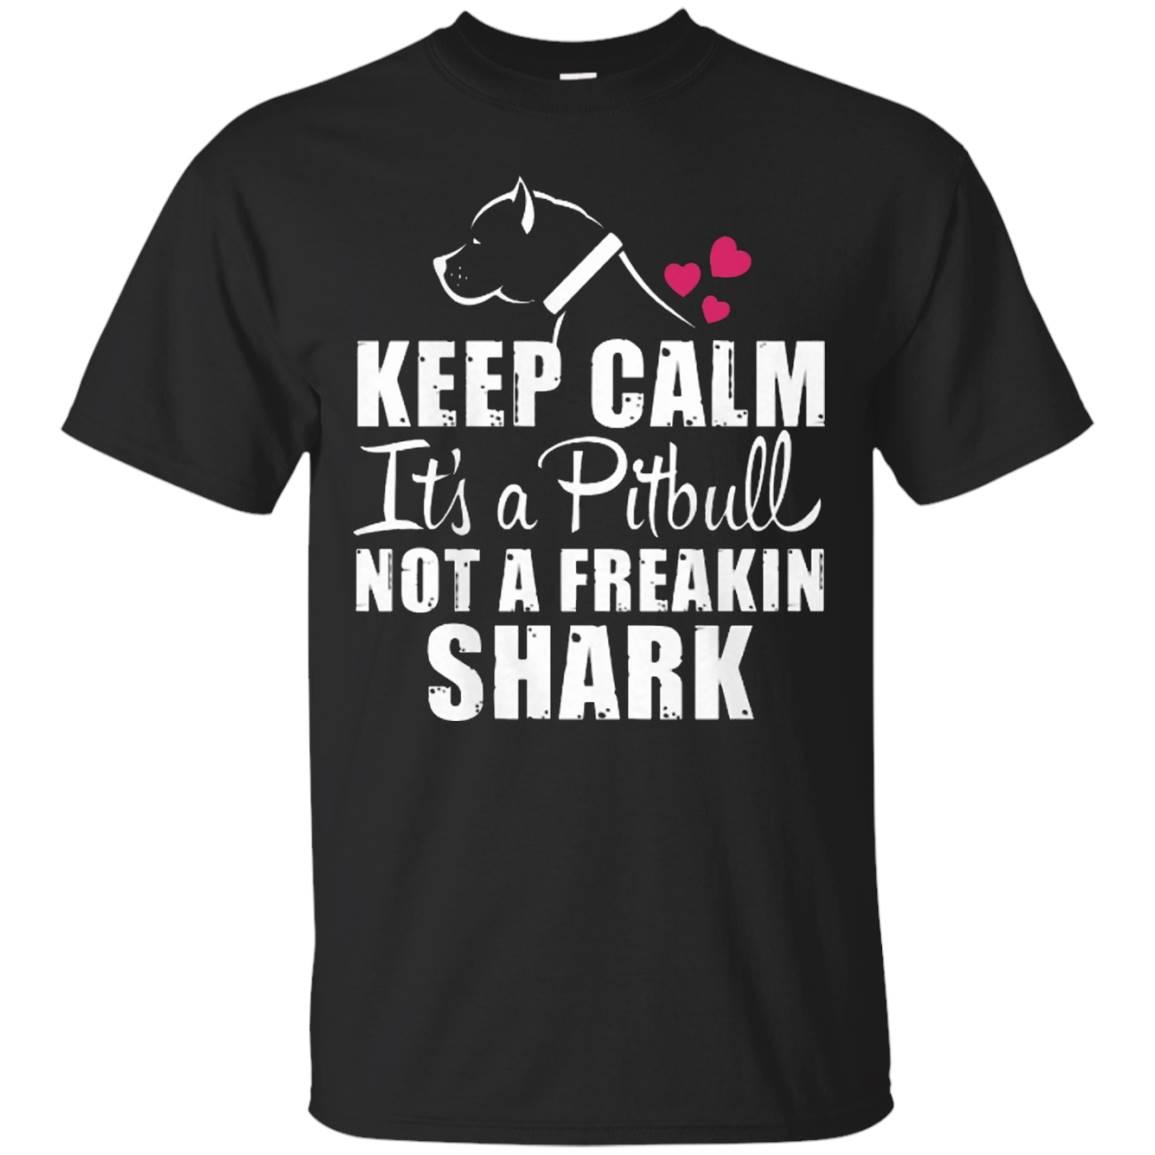 Keep Calm Its a Pitbull Not a Freakin Shark T-Shirts